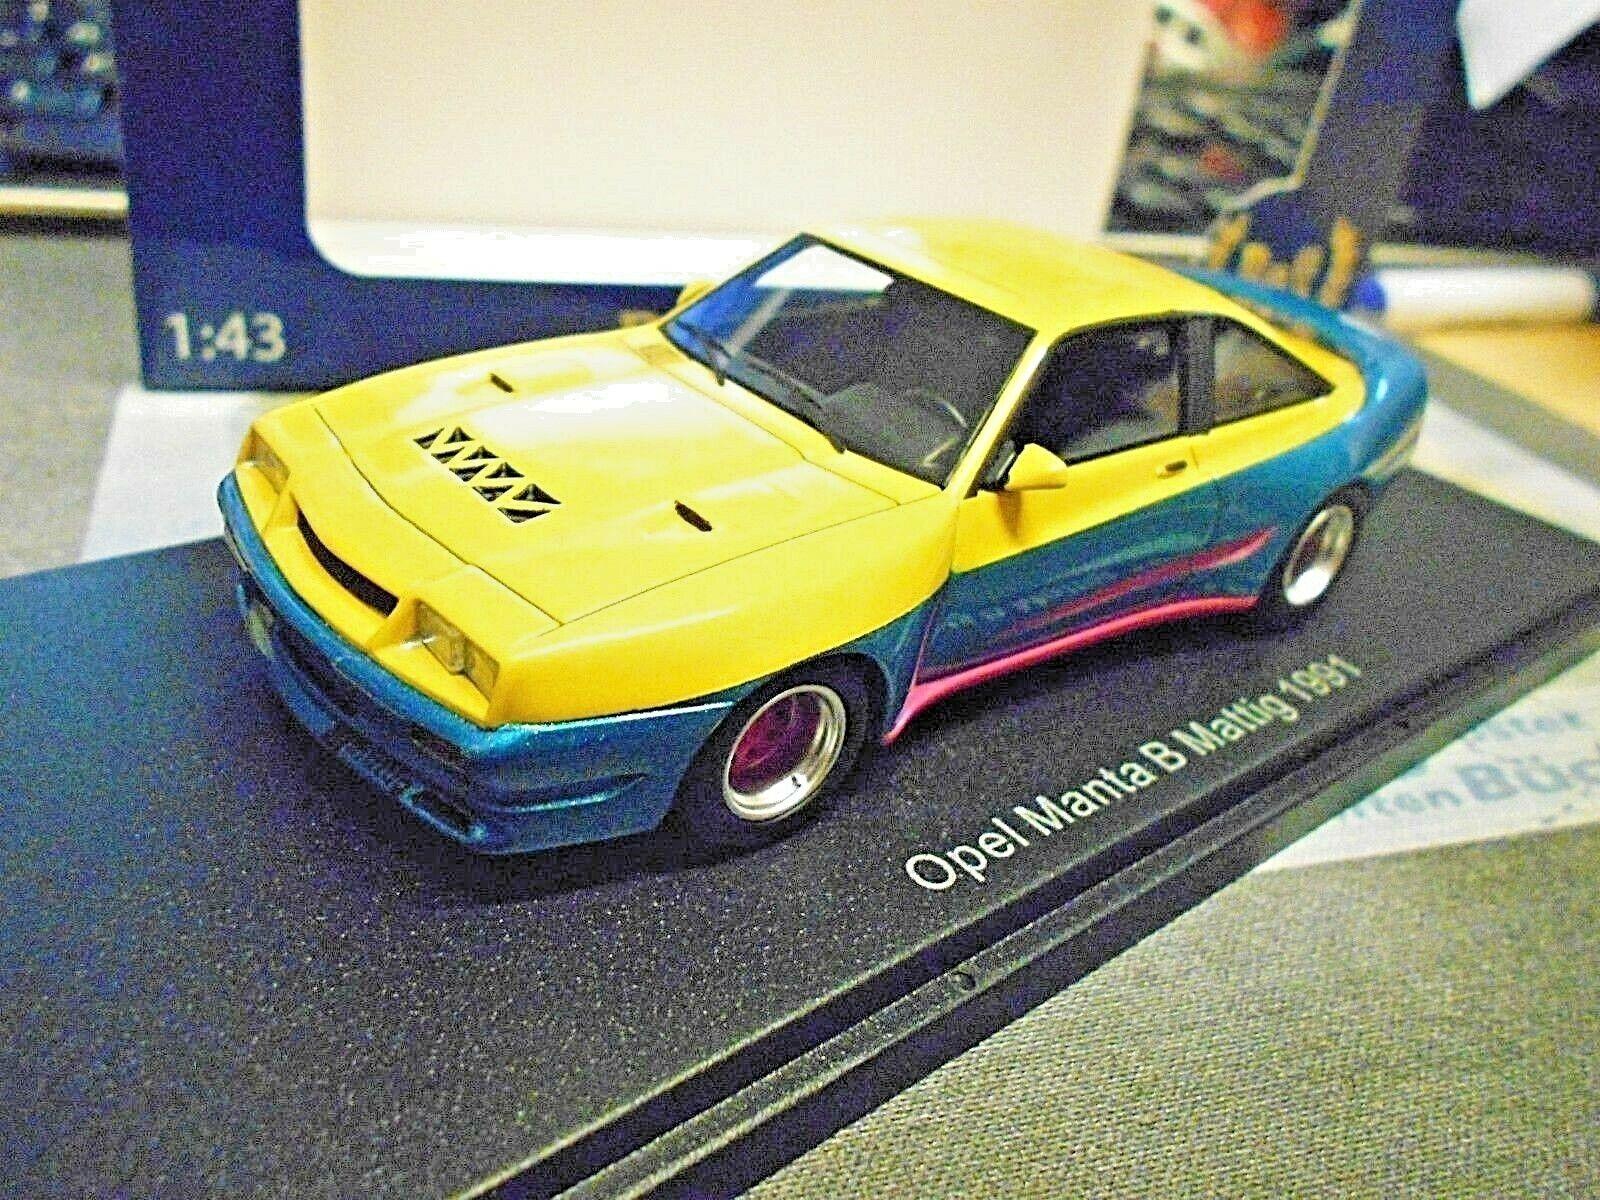 Opel Manta B 400 Mattig Breitbau Tuning tv cinéma Movie 1991 Resin Bos 1 43